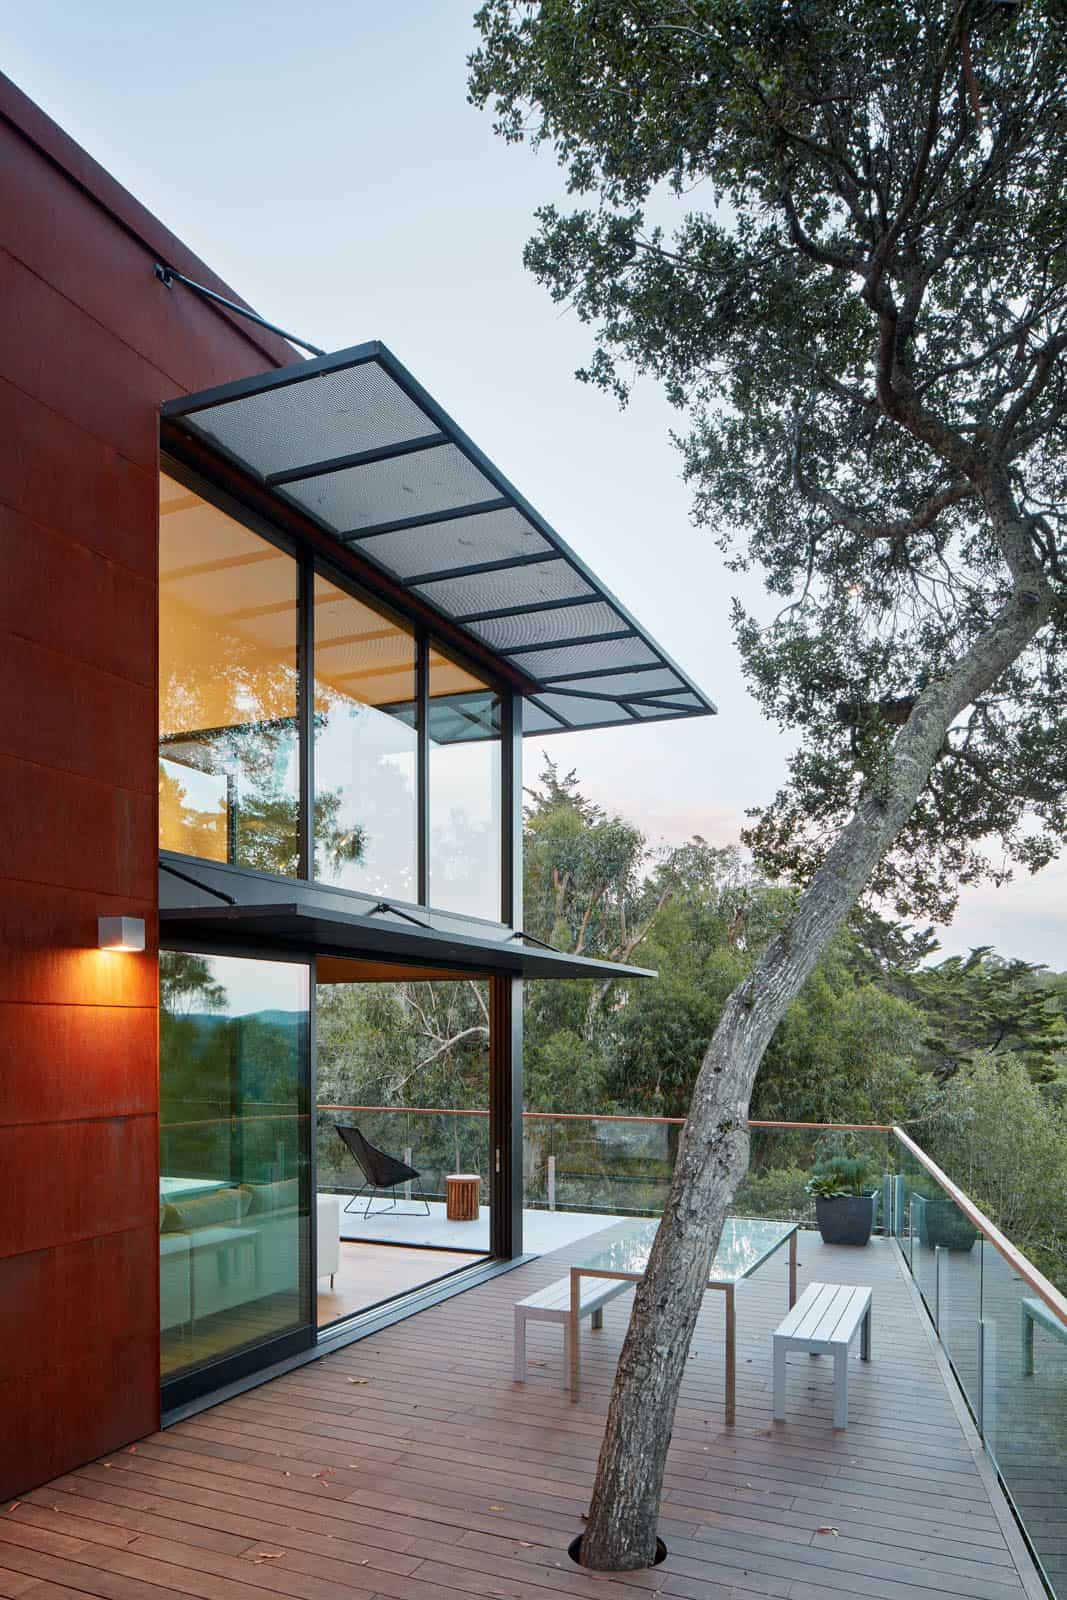 441 Tamalpais Ave | Hillside House by Zack de Vito (23)